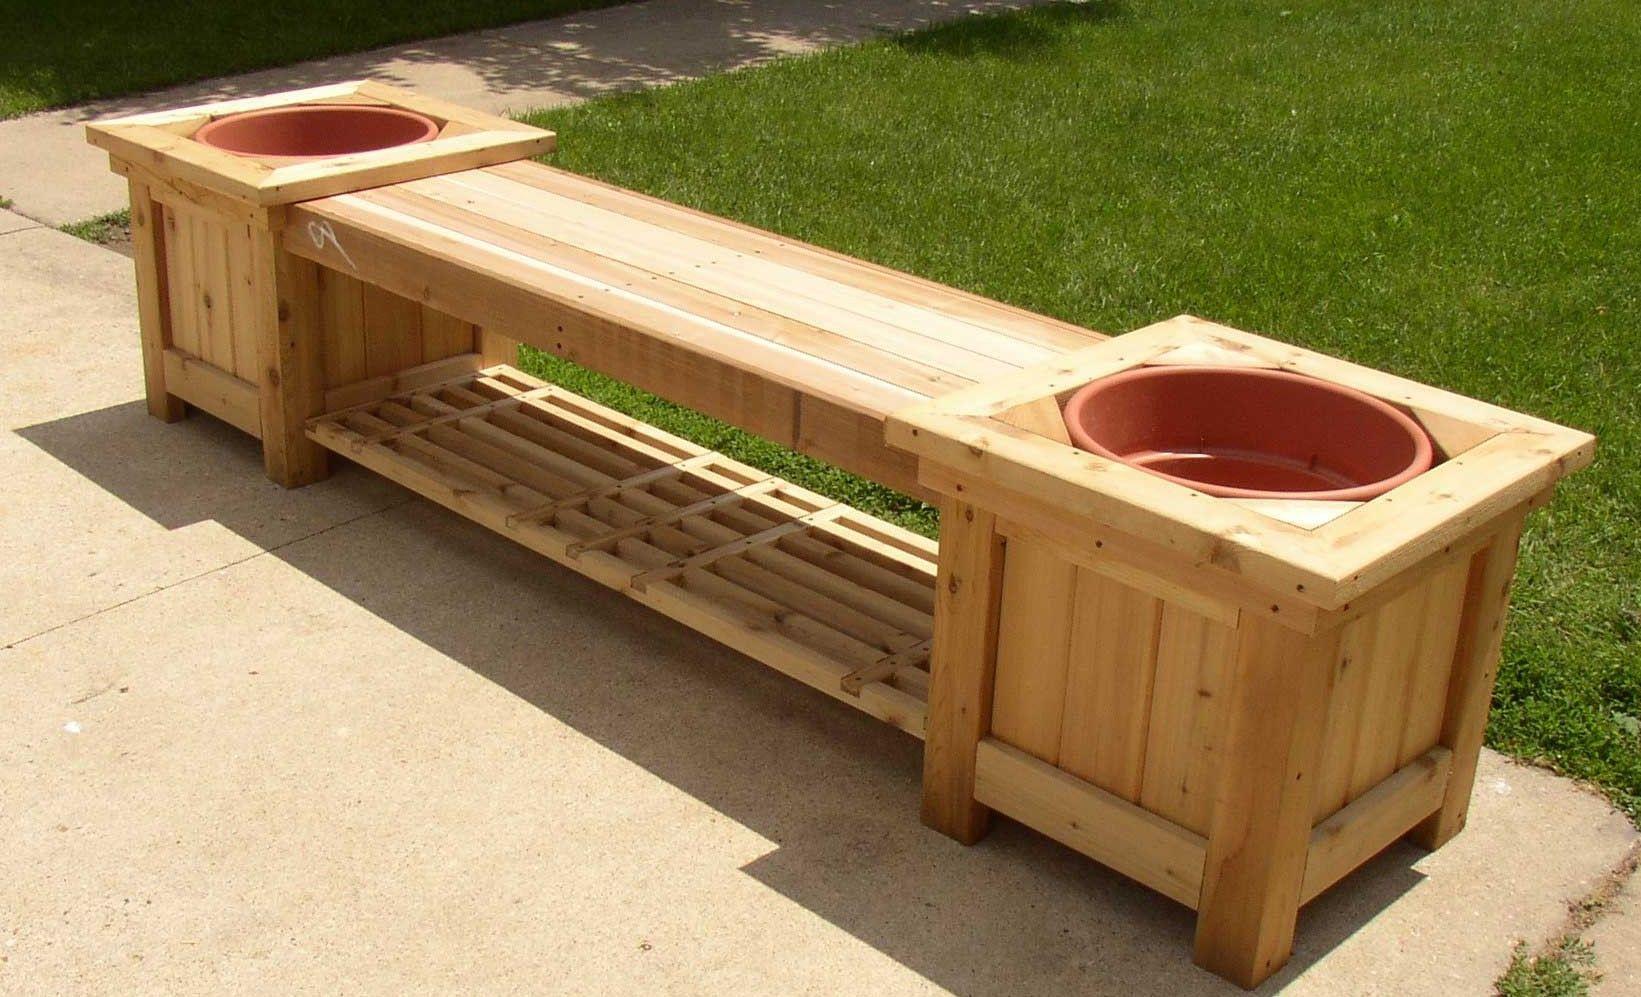 Transformation Palette En Jardiniere diy wood planter bench plans wooden pdf build woodworking